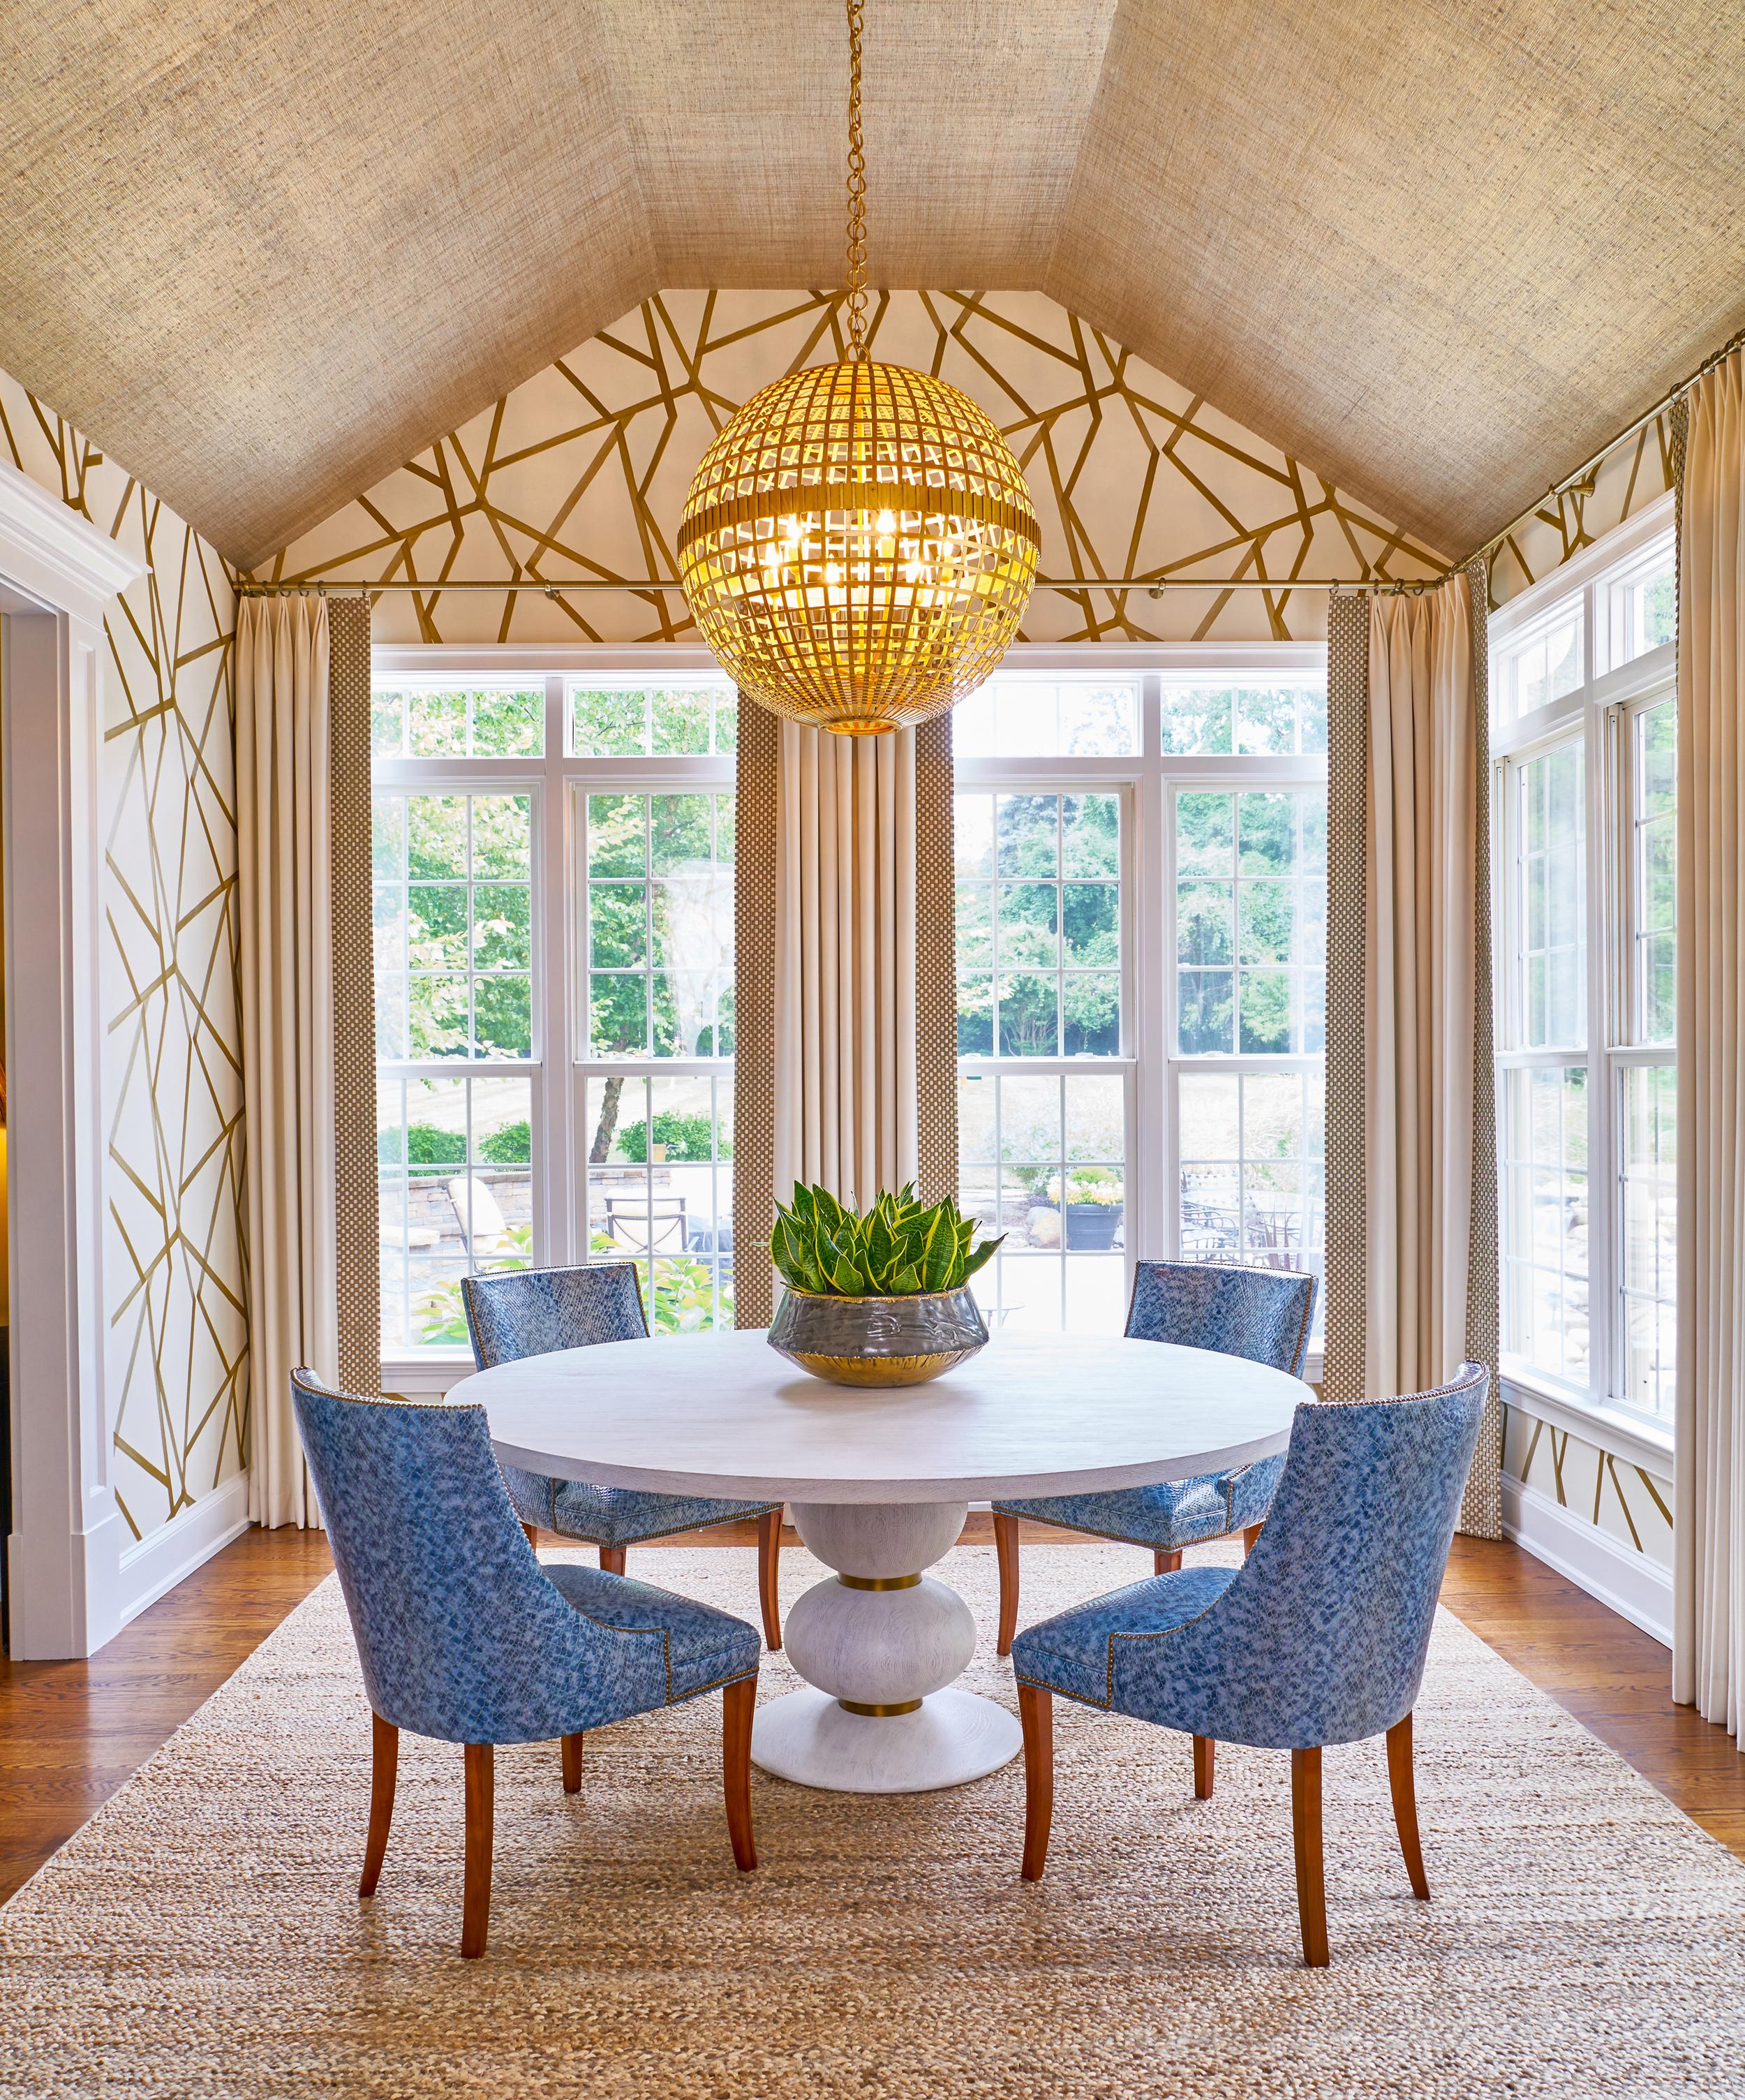 Striking wallpaper creates a modern morning room.